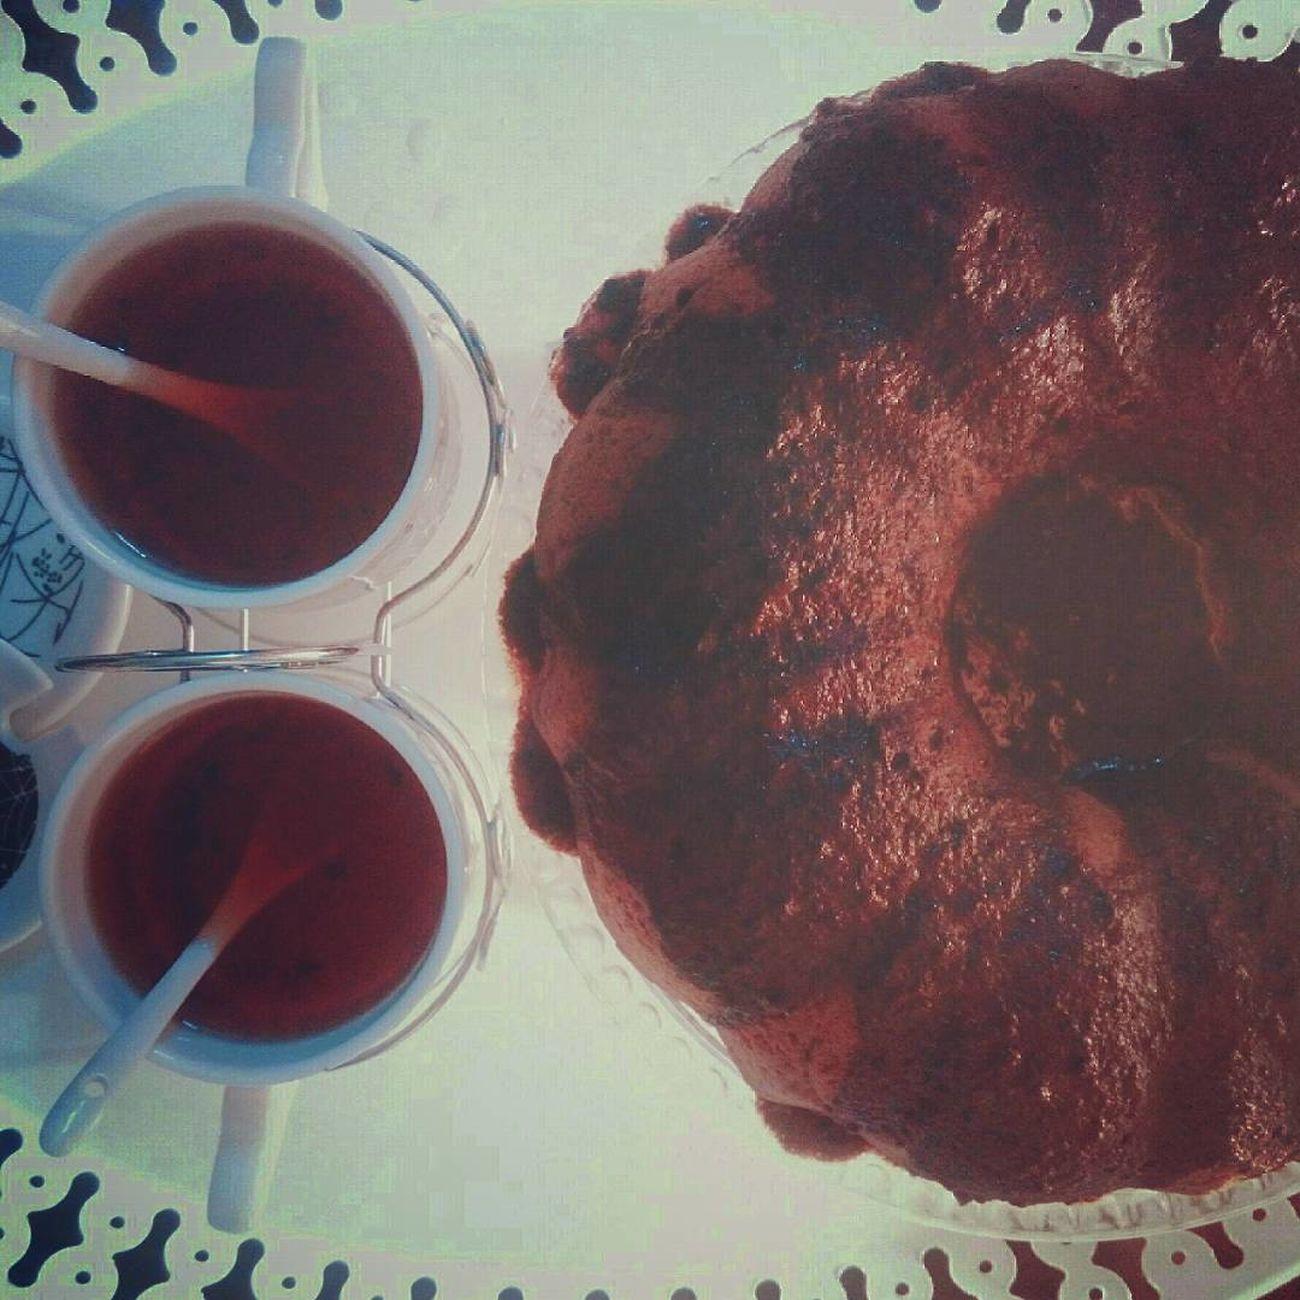 ☕🍪🍩🍫 No People Love ♥ Relaxing First Eyeem Photo Beautiful By Me 👆 Drink Chocolate♡ Women Tea Time Bestfriend Best Time